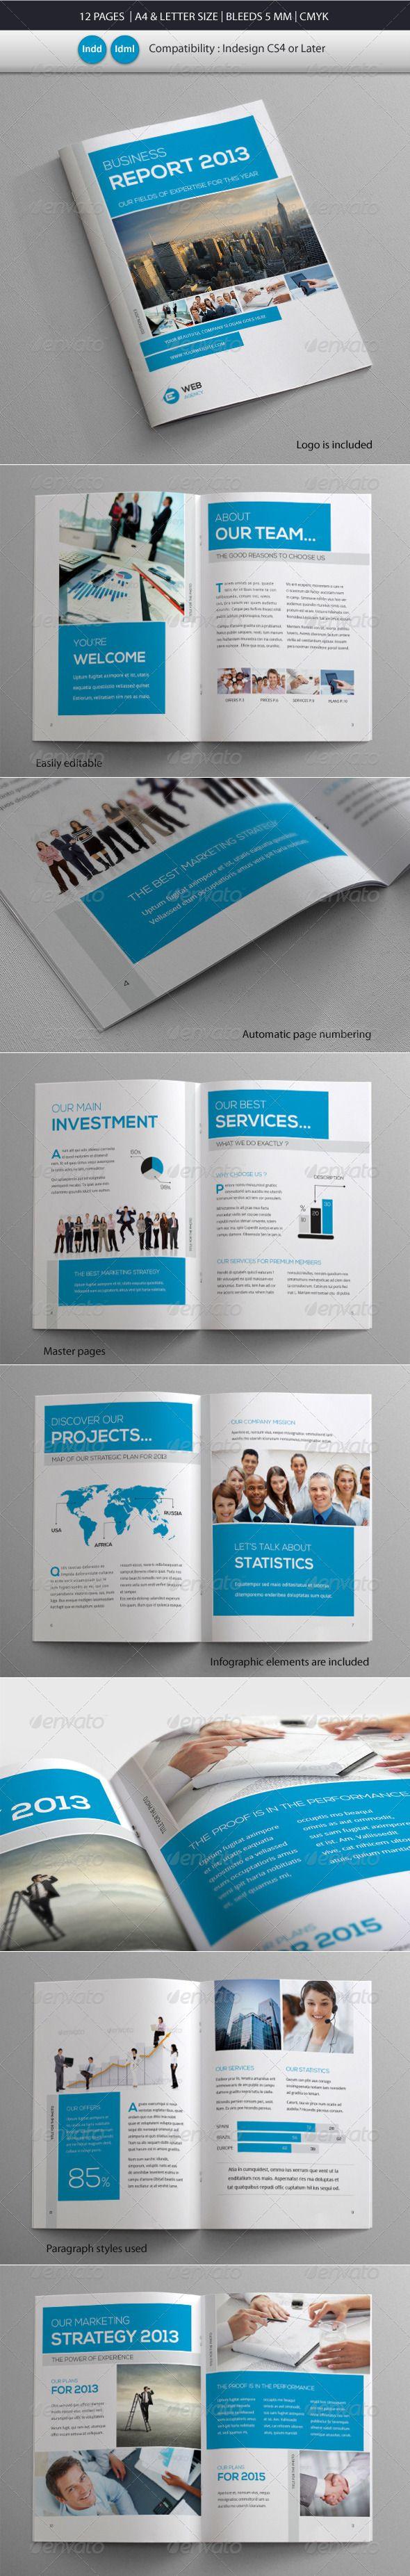 Coprorate Business Brochure Report Template – Corporate Report Template